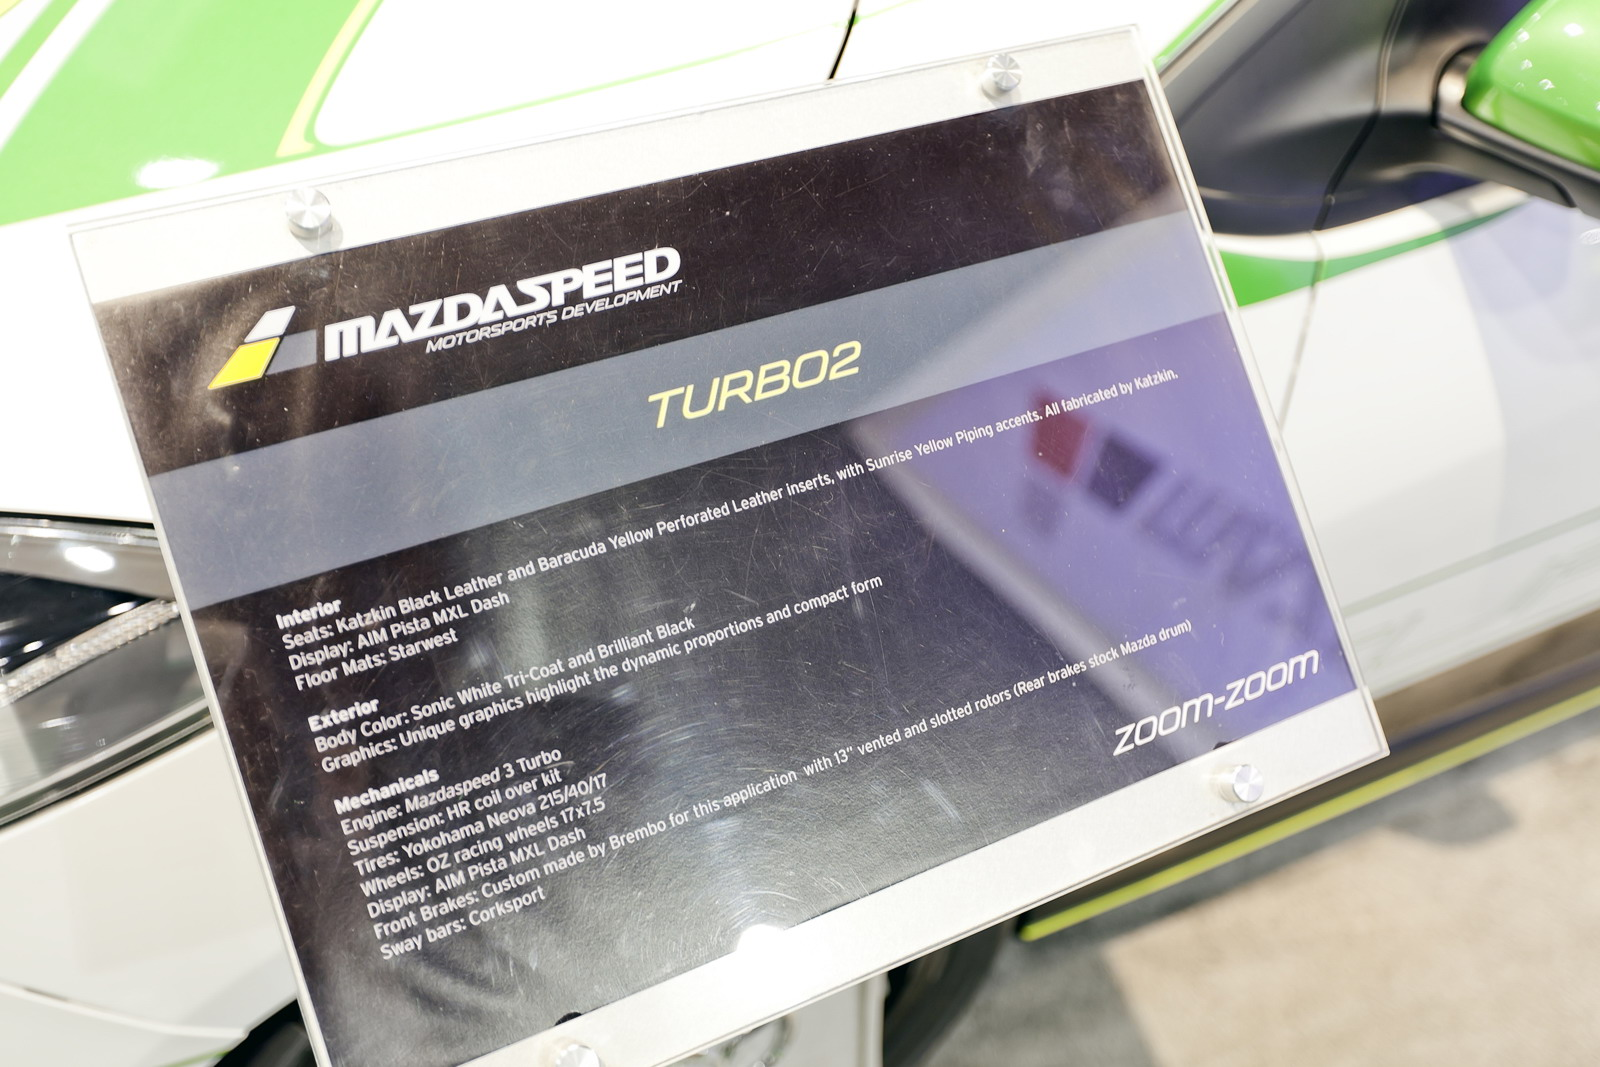 hight resolution of mazda turbo 2 top speed